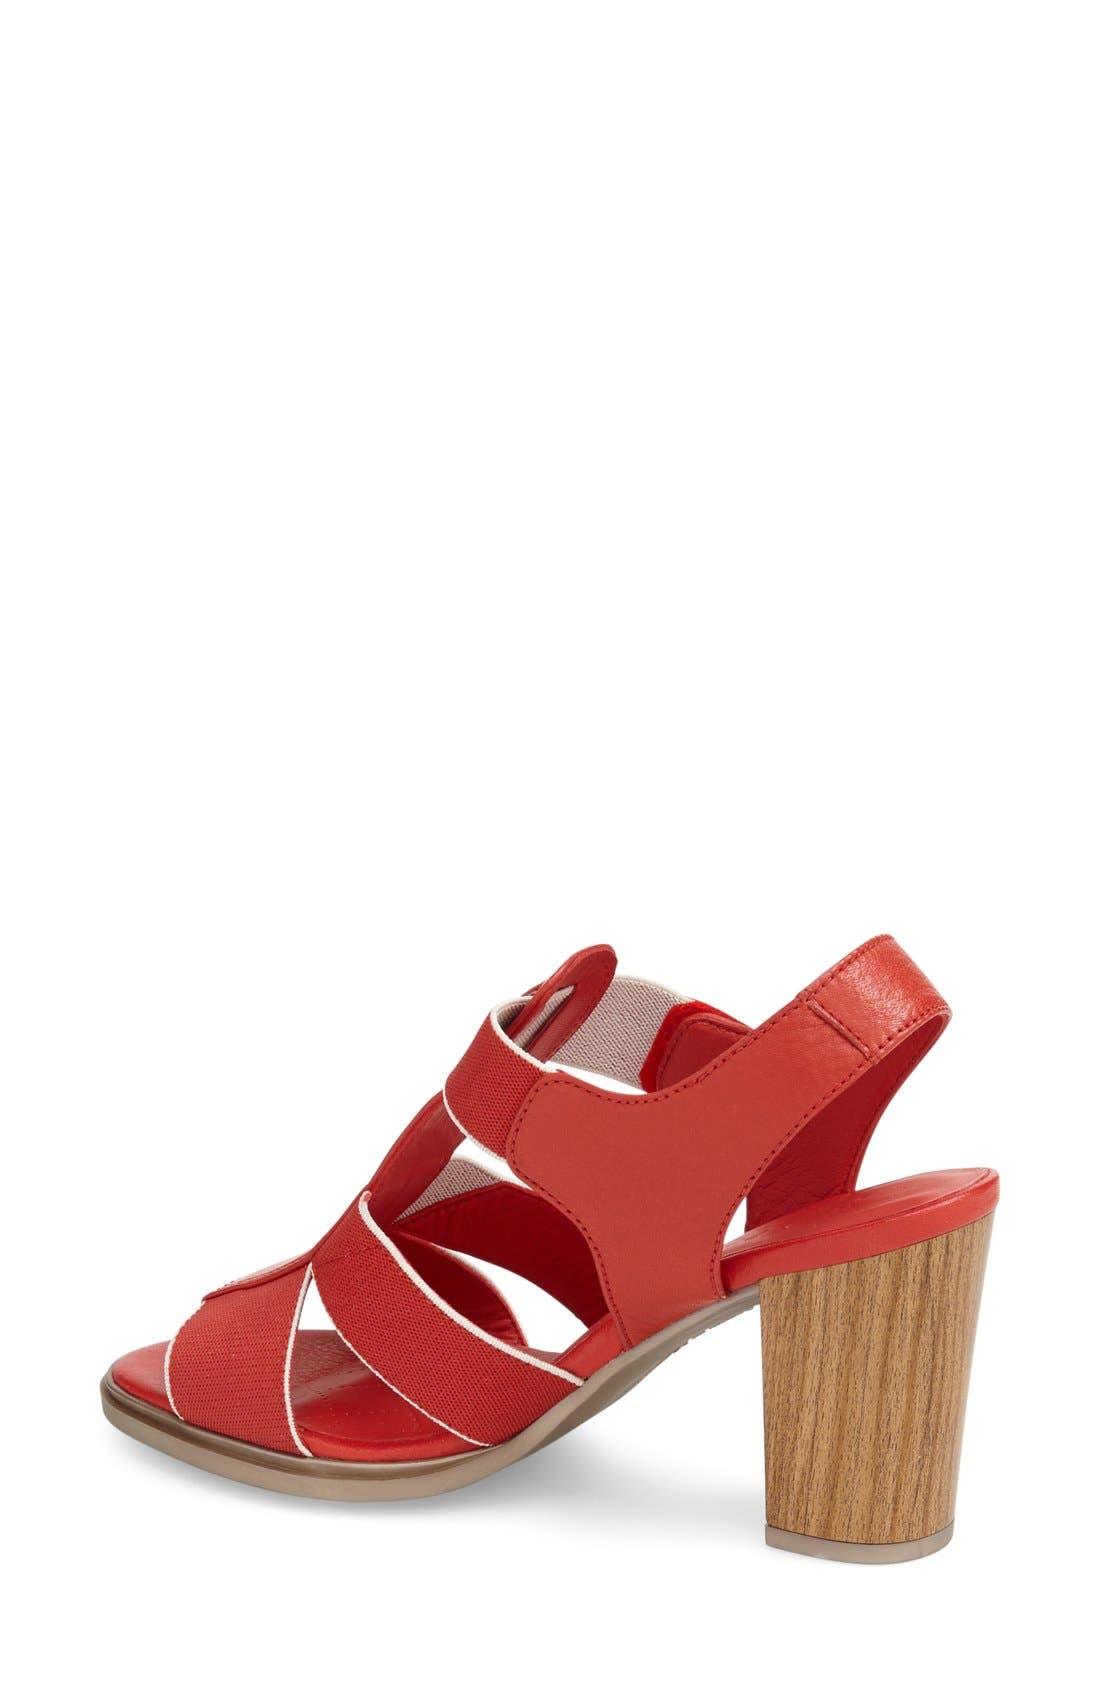 'Matchless' Sandal,                             Alternate thumbnail 4, color,